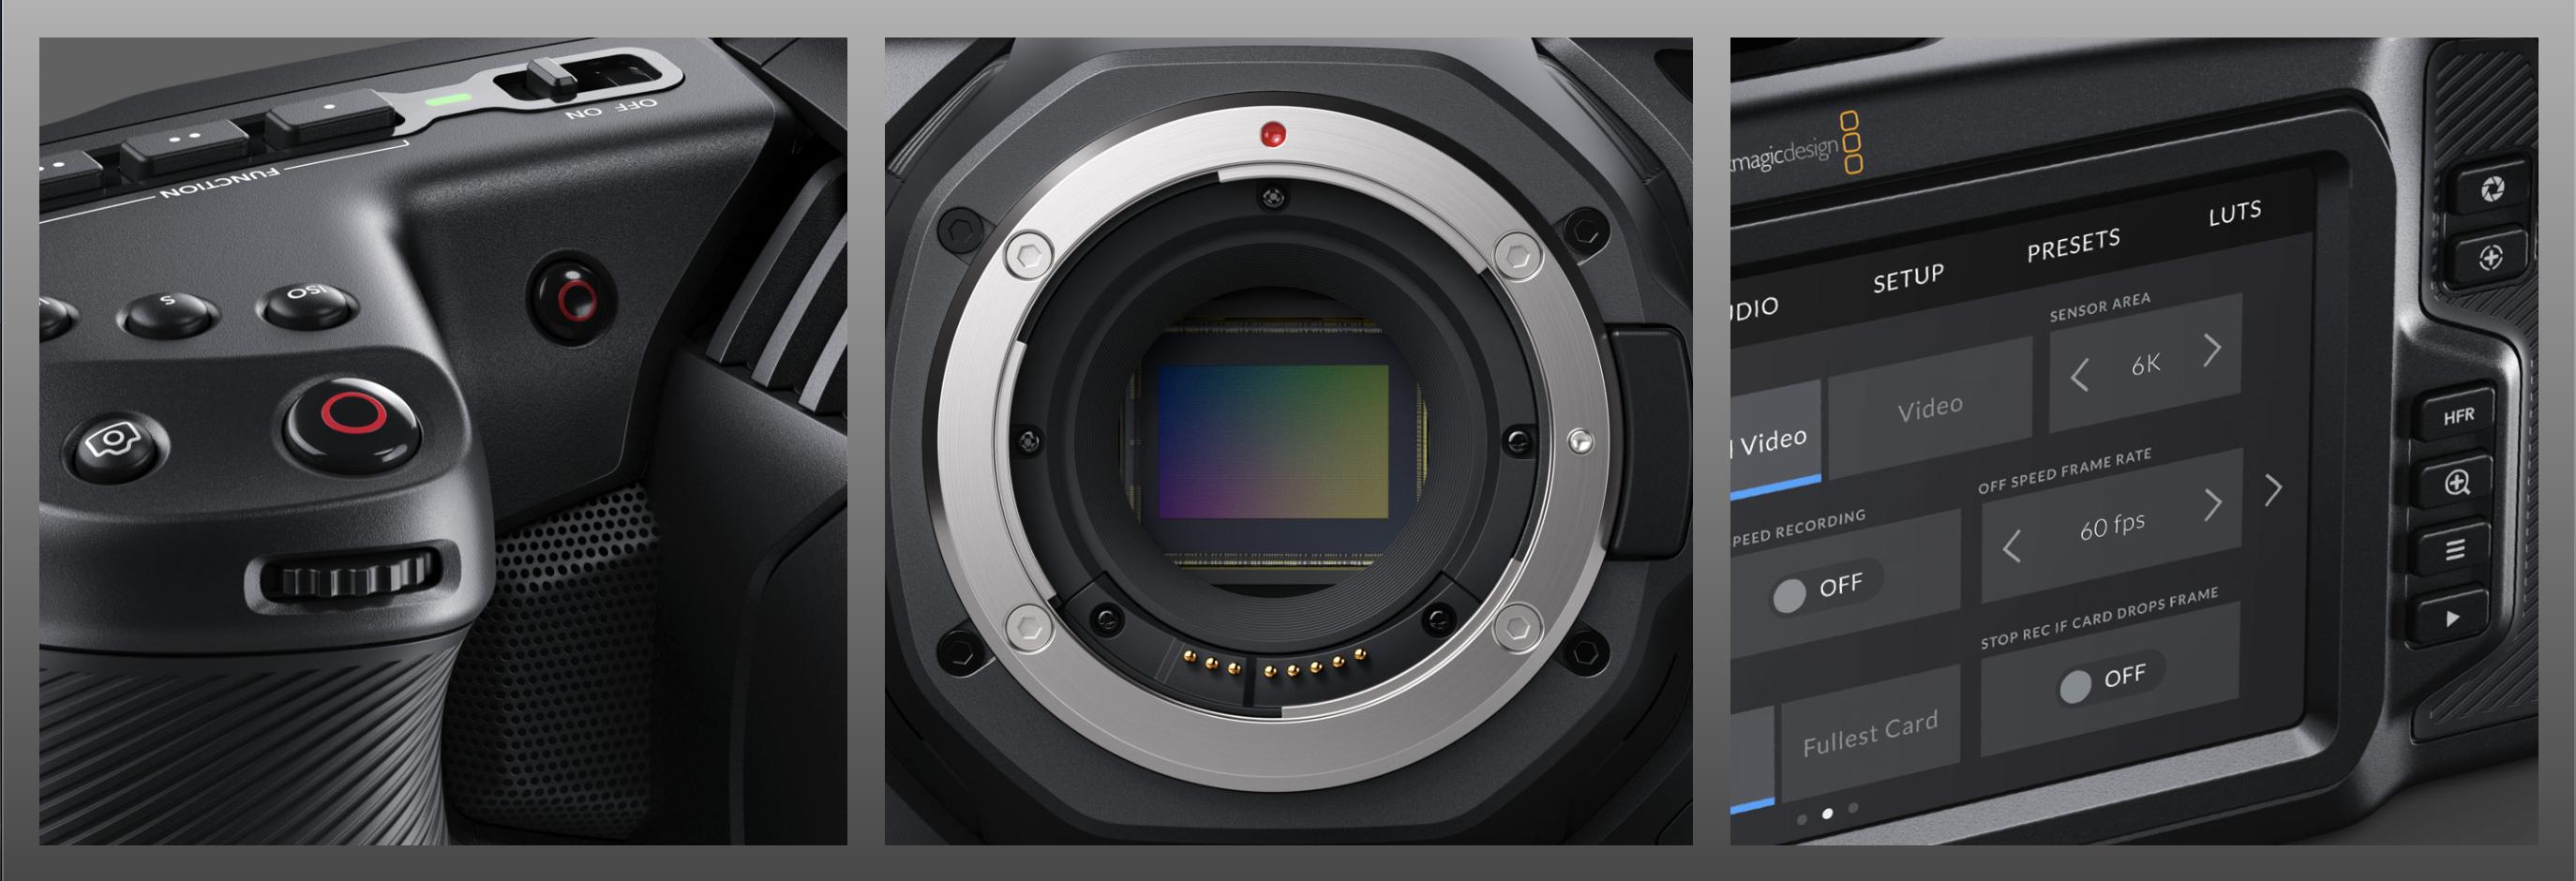 Rent Blackmagic Pocket Cinema Camera 6k Deckhand Camera Rentals